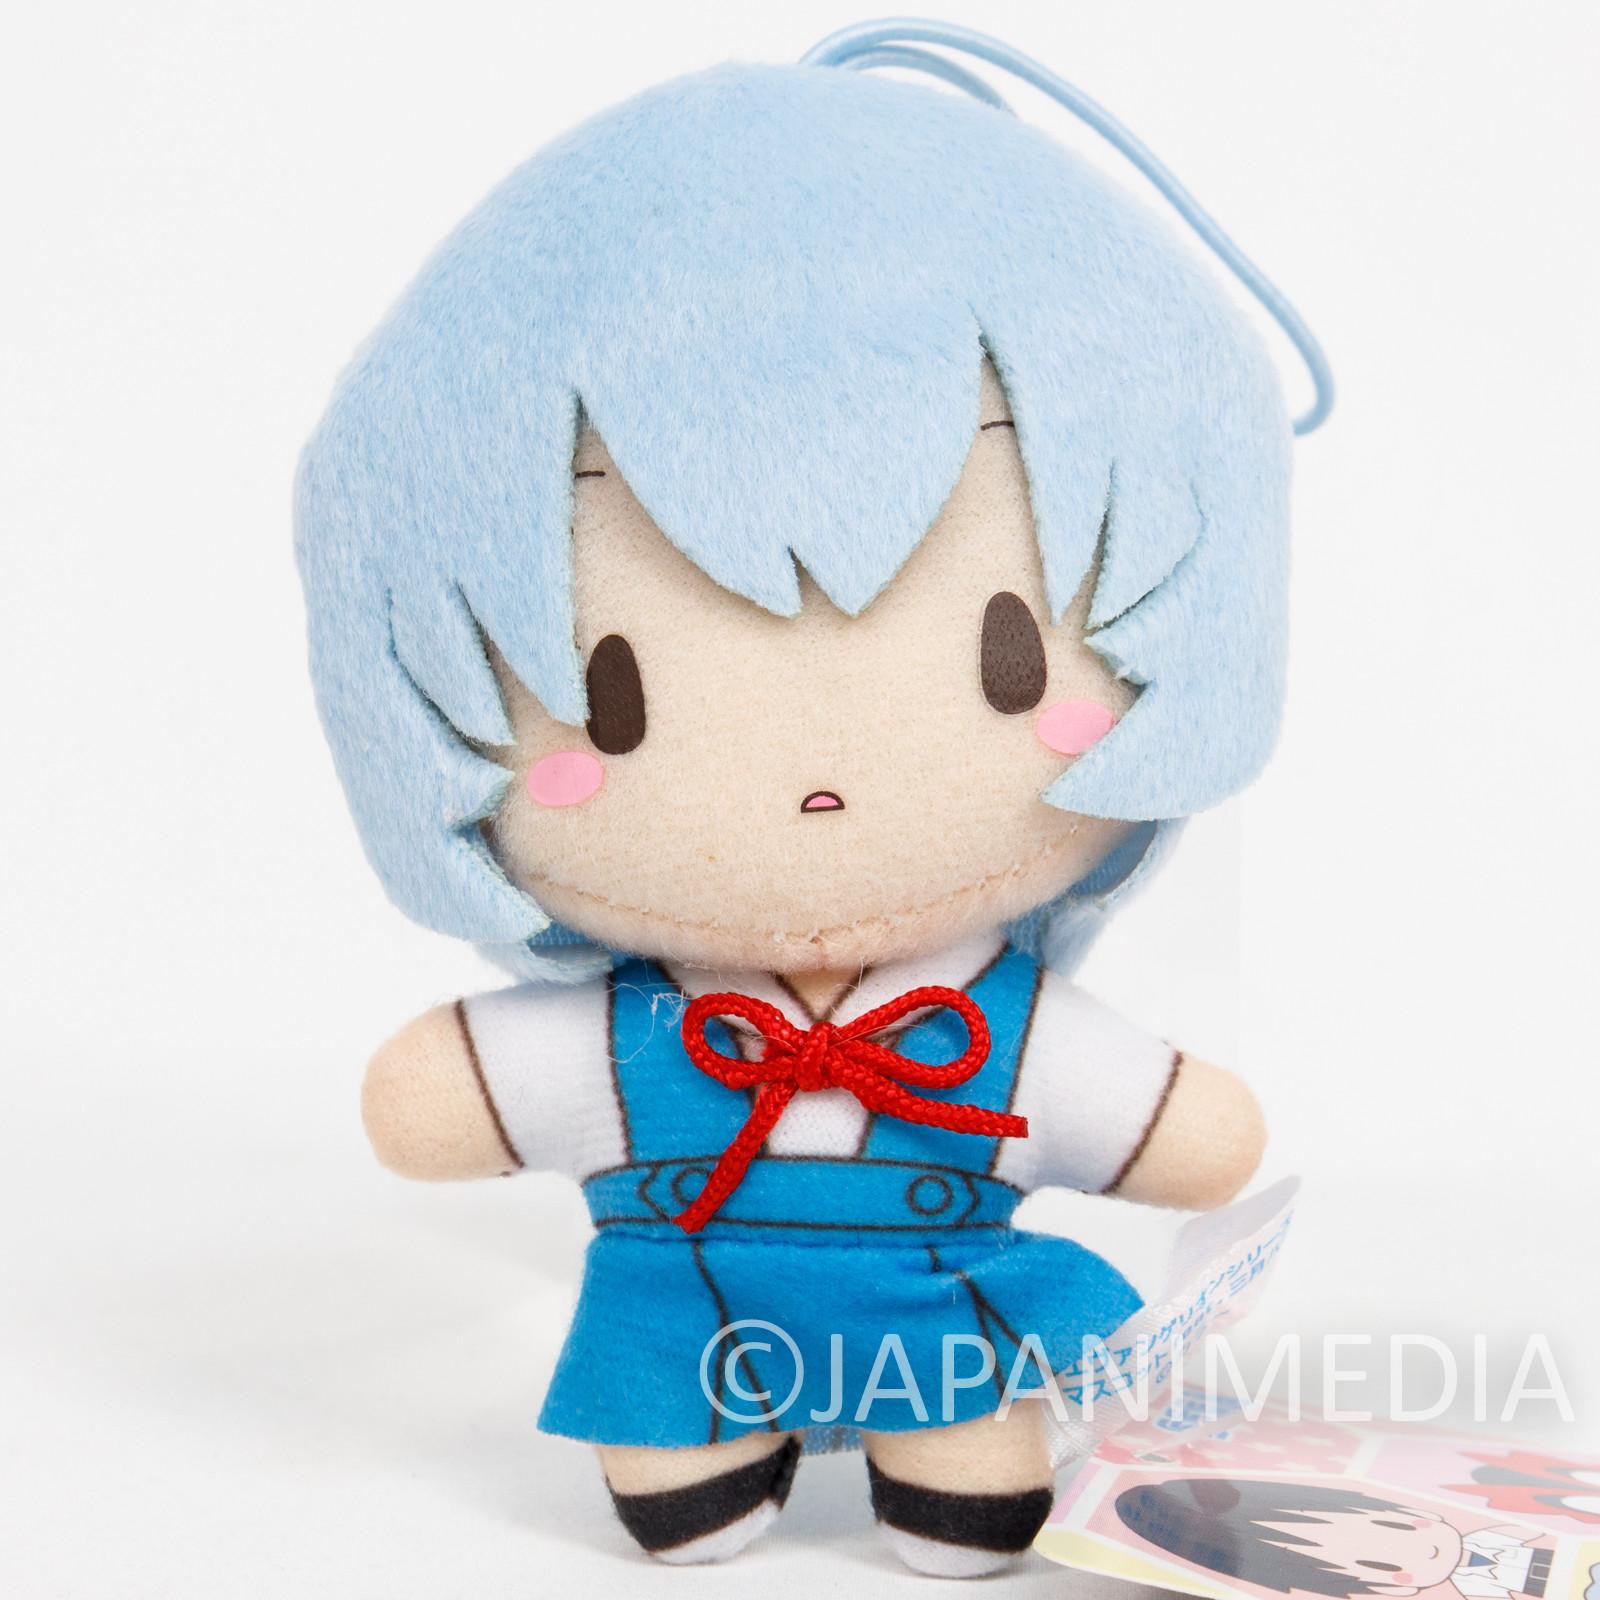 Evangelion Rei Ayanami Mini Plush Doll SEGA JAPAN ANIME MANGA 2